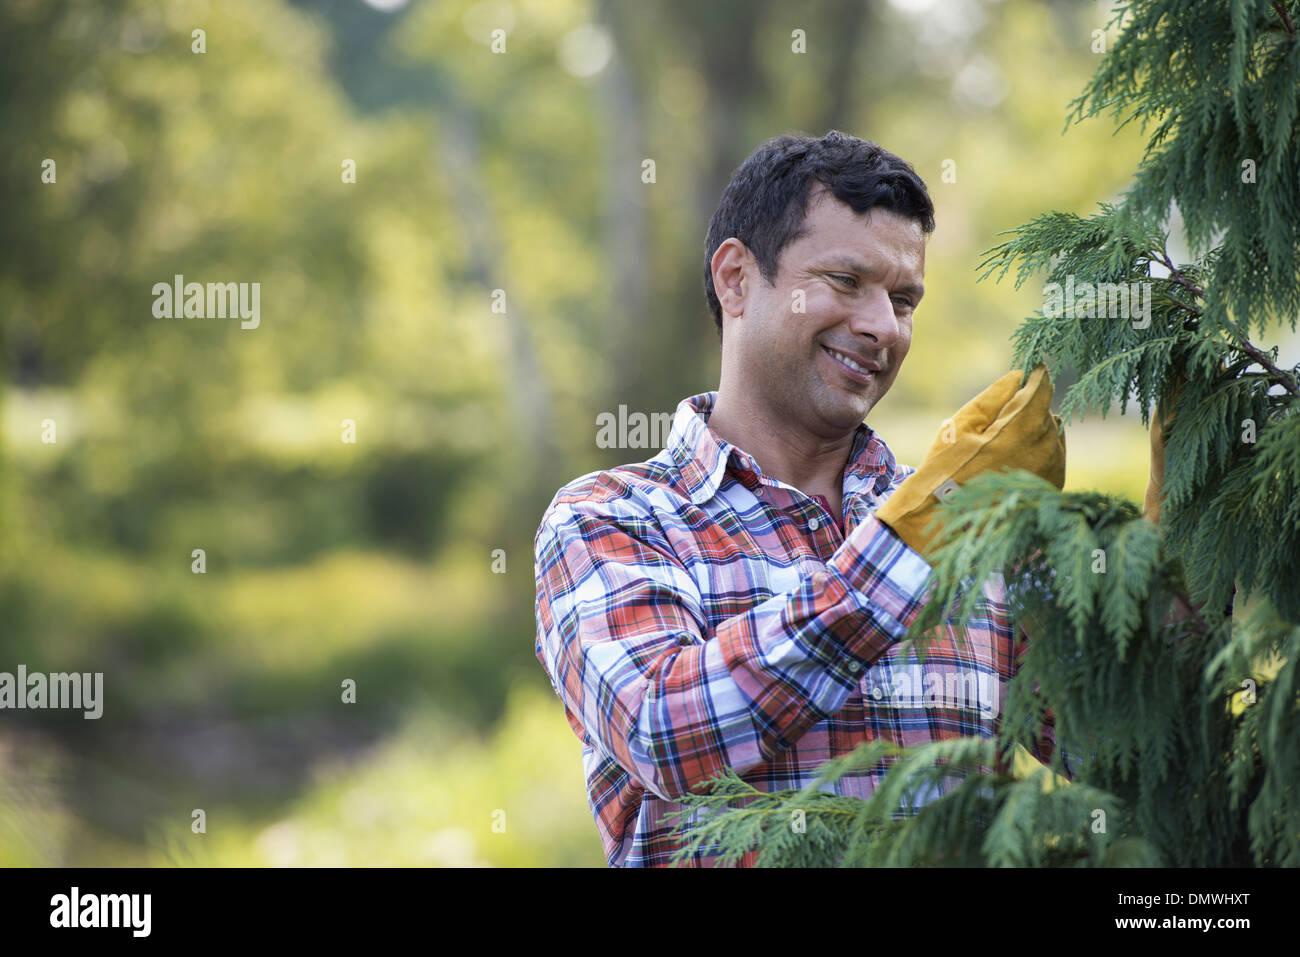 A man pruning an organically grown christmas tree. - Stock Image